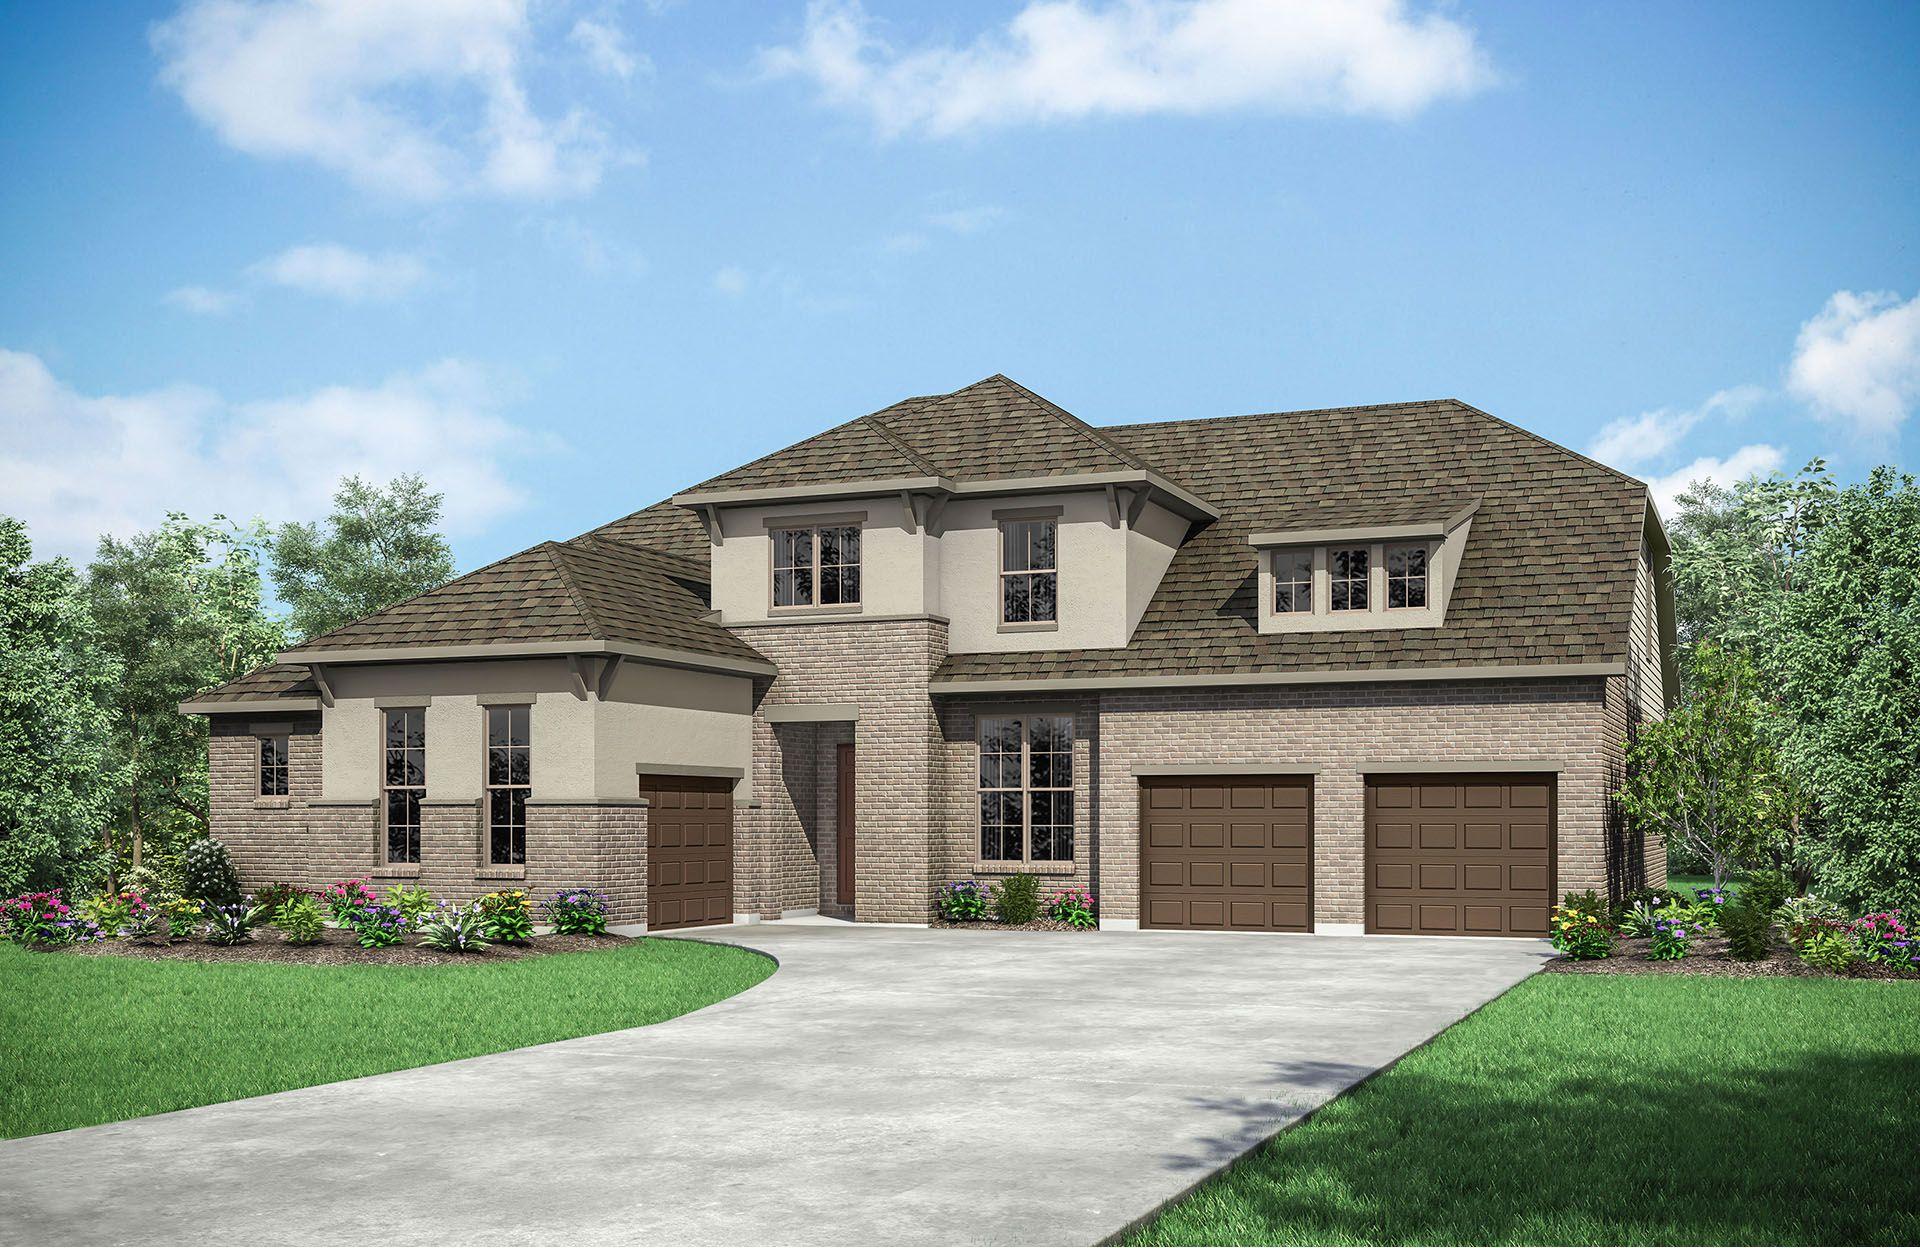 Single Family for Active at Viridian - Grantley 1344 Viridian Park Lane Arlington, Texas 76005 United States